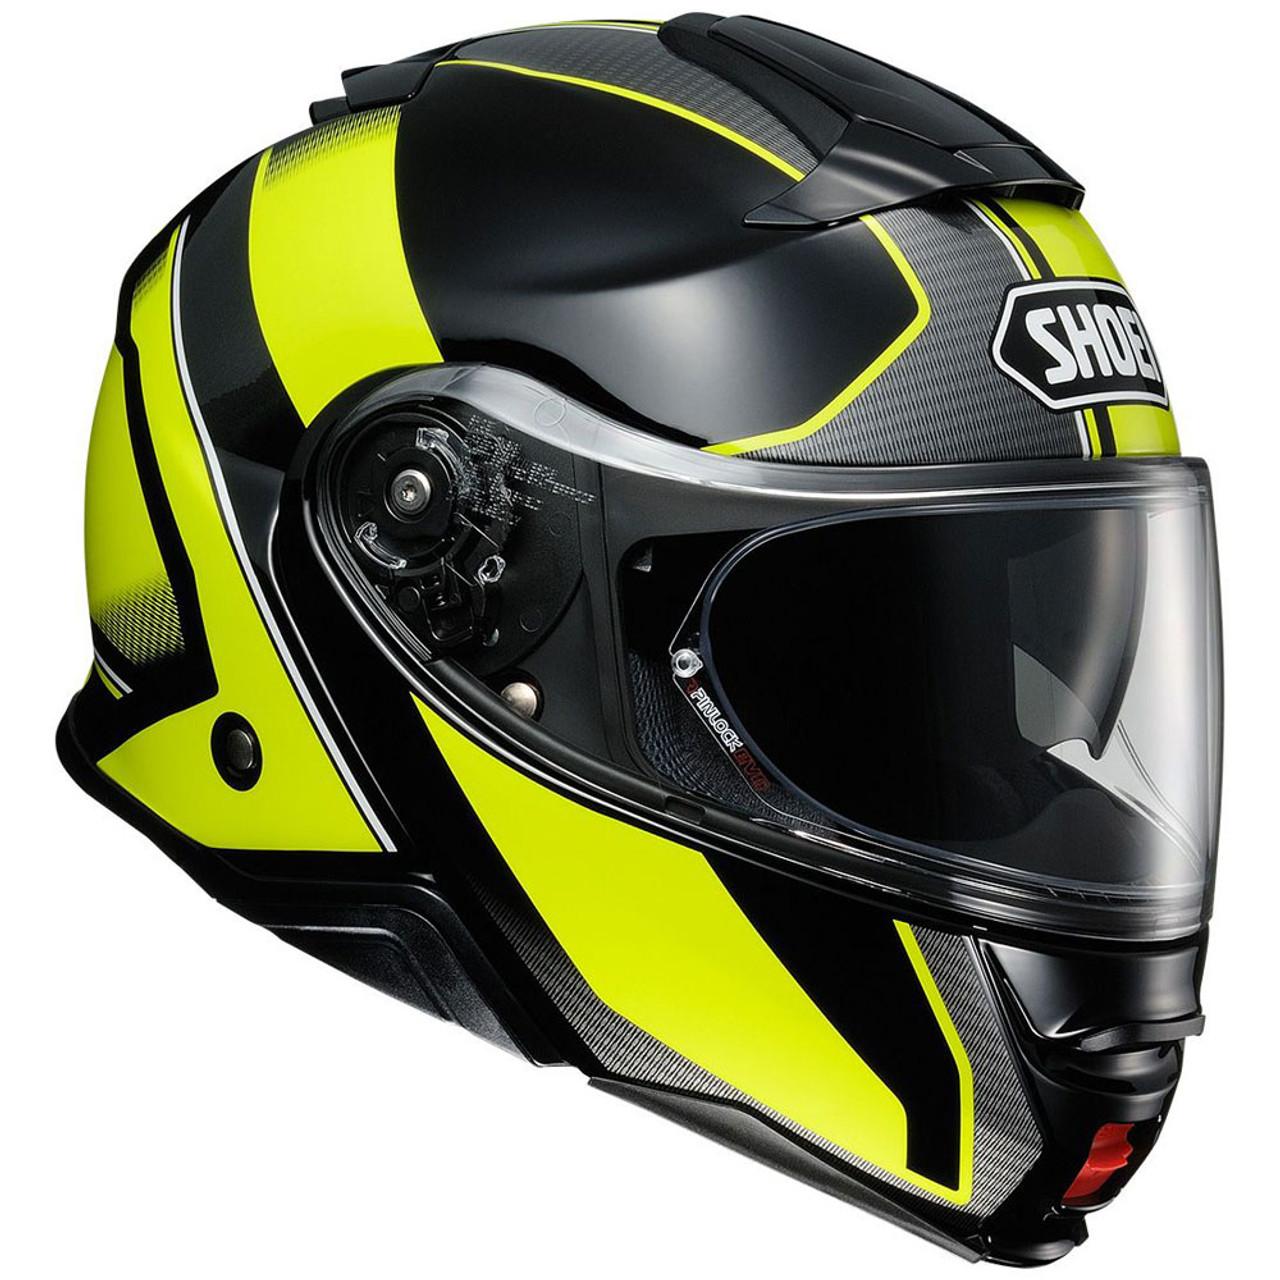 757b4642 Shoei Neotec 2 Modular Motorcycle Helmet - Excursion TC-3 - Get ...